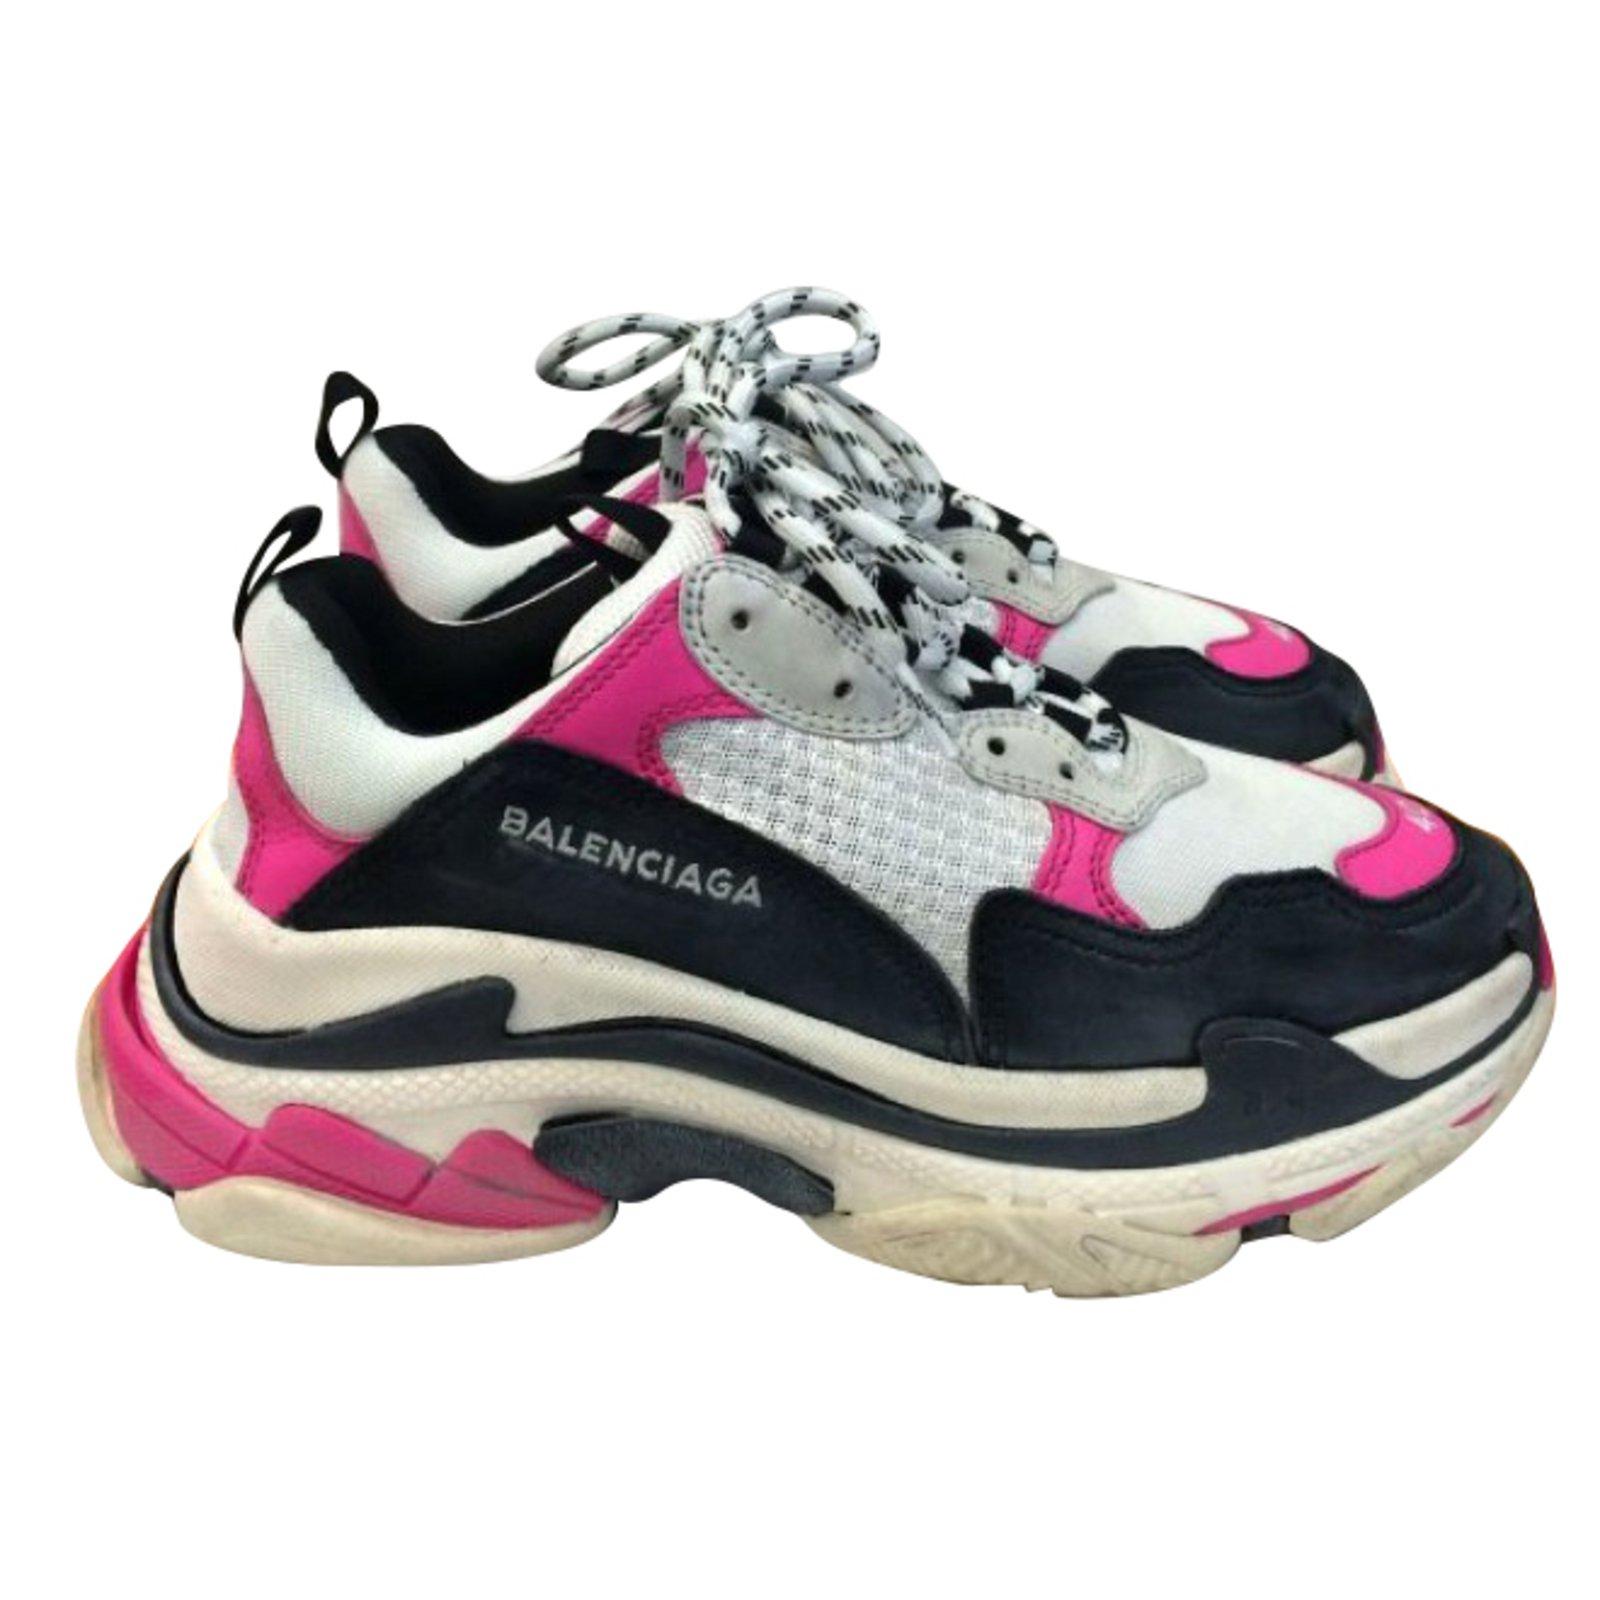 Balanciaga Shoes Sale